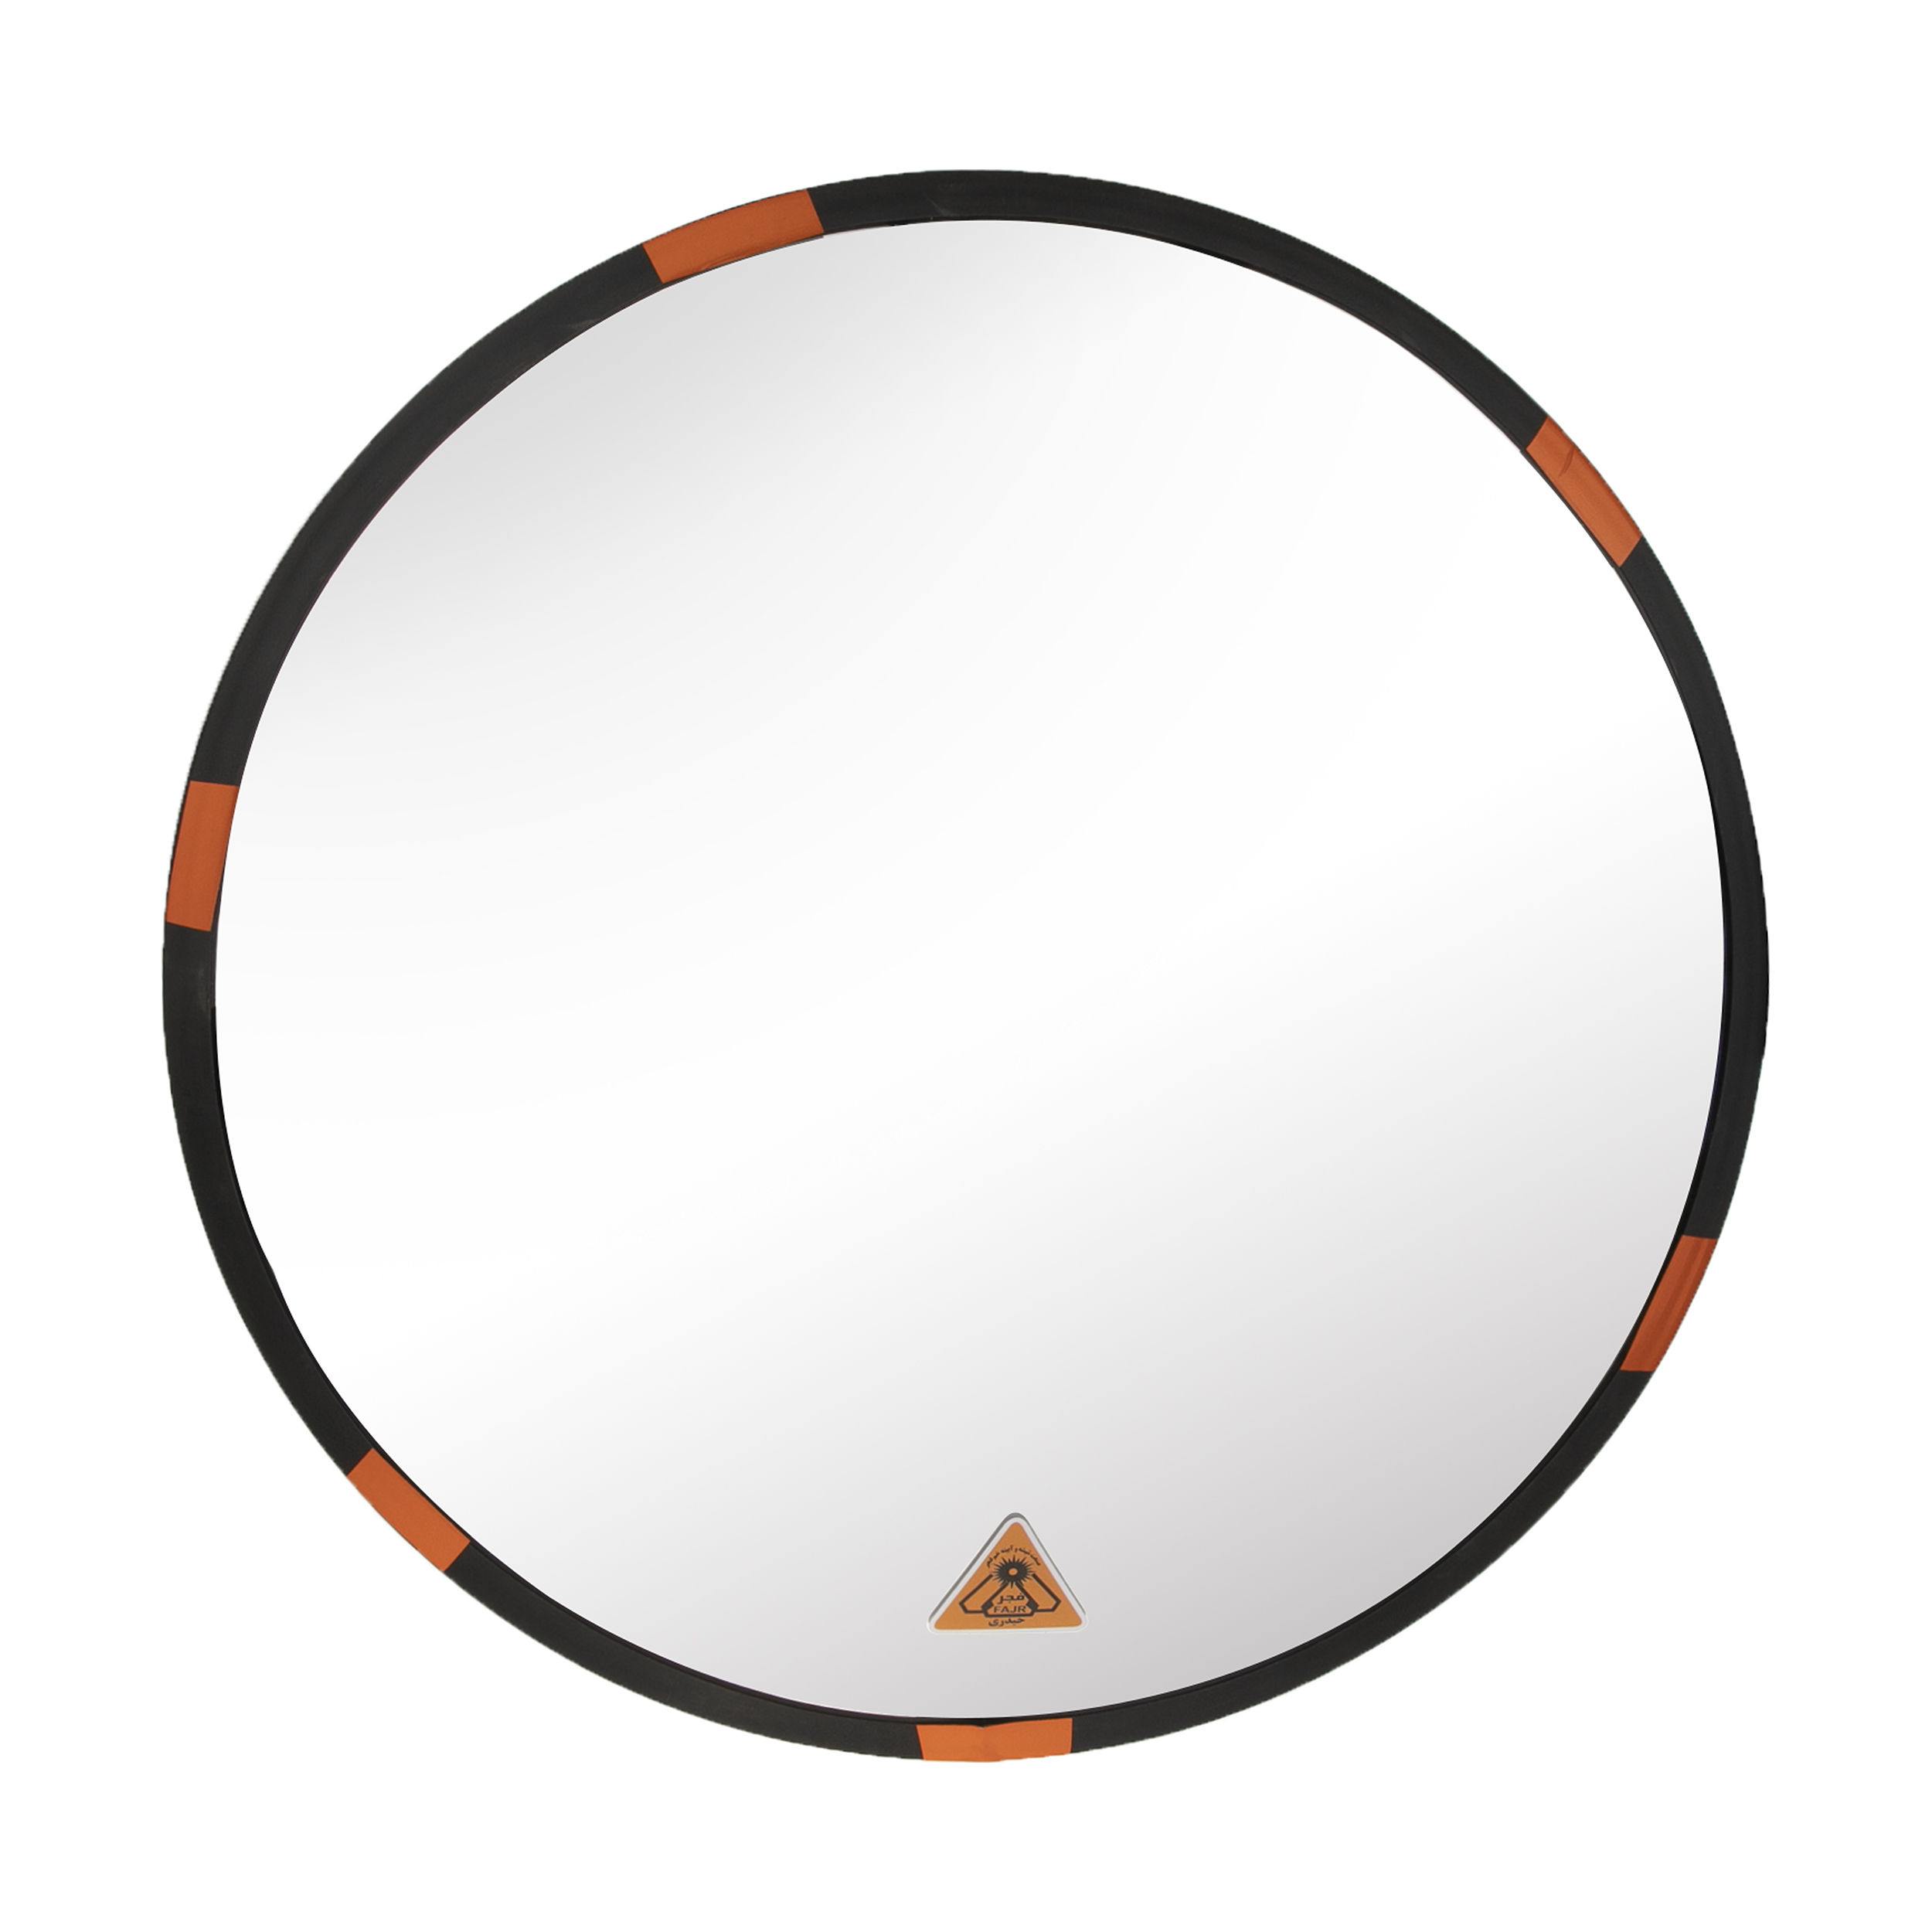 آینه محدب صنعت شیشه و آینه خم فجر مدل SS-011